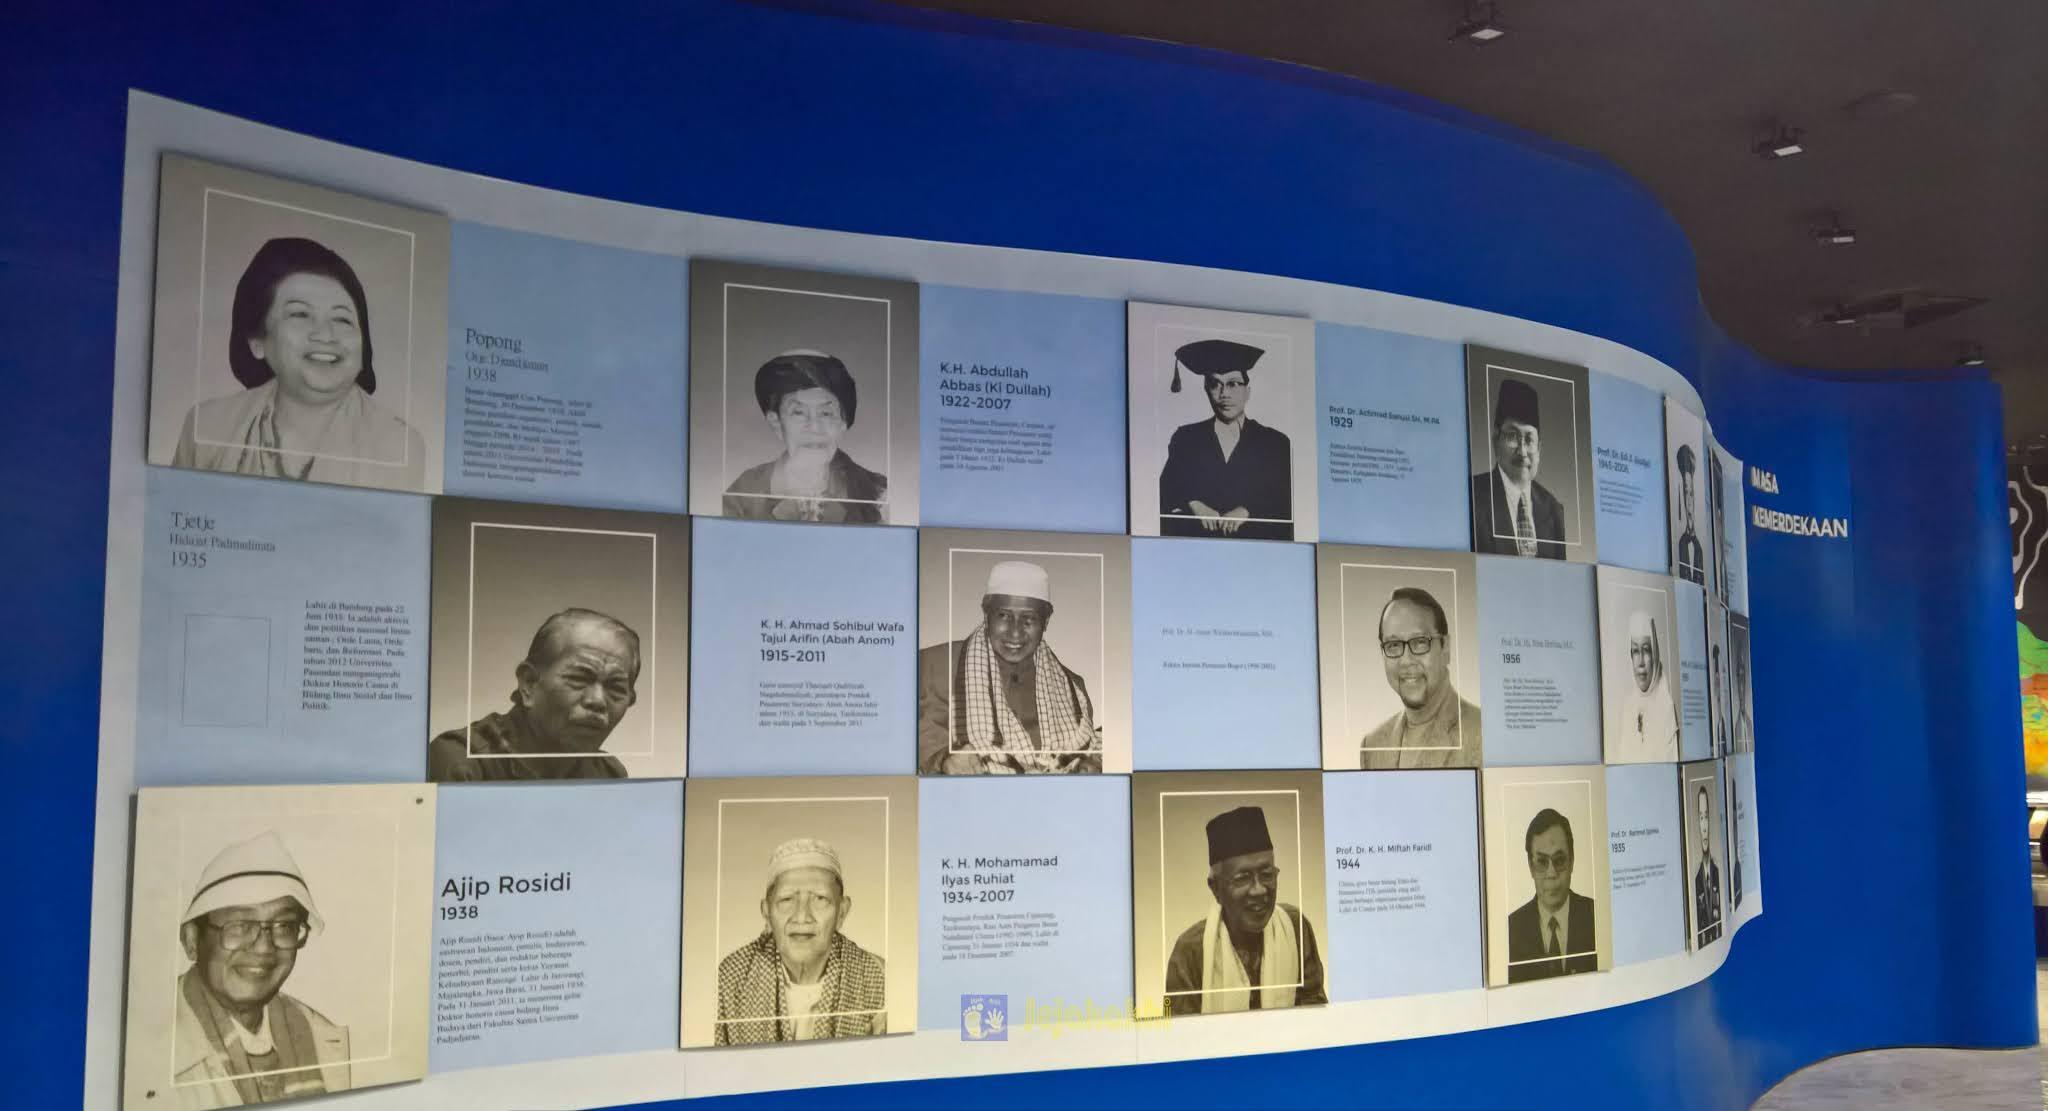 Jelajah Museum: Berkumpulnya Pesohor Jawa Barat di Hall Of Fame - Panggung Inohong